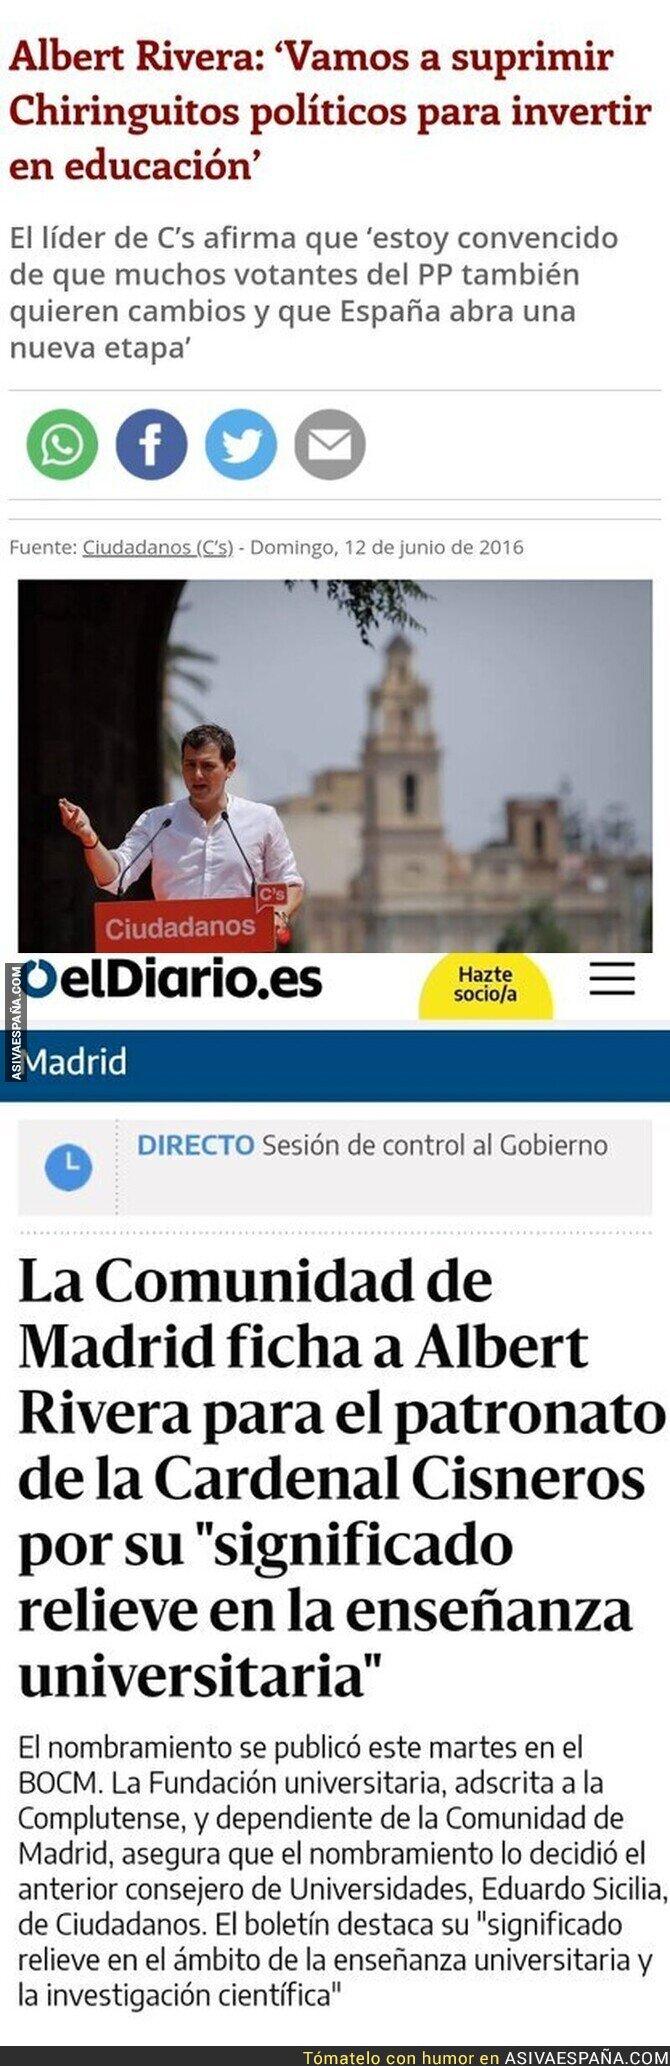 698697 - Vaya con Albert Rivera...